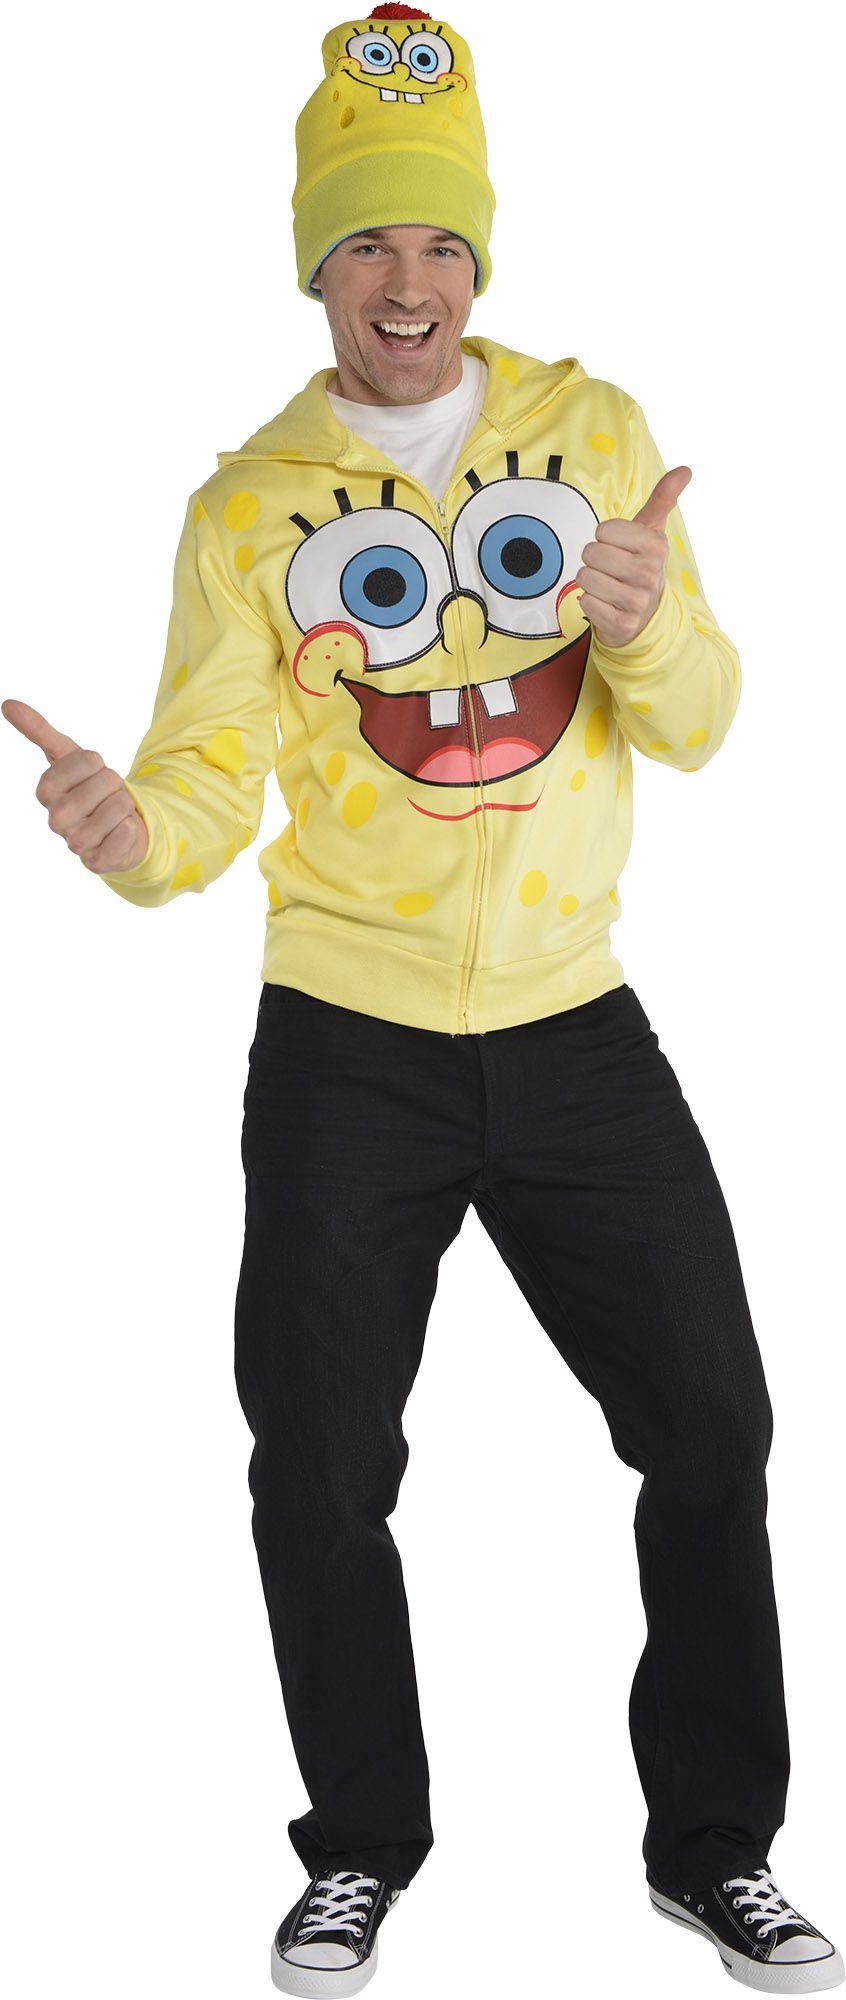 Create Your Look - Male Sponge Bob